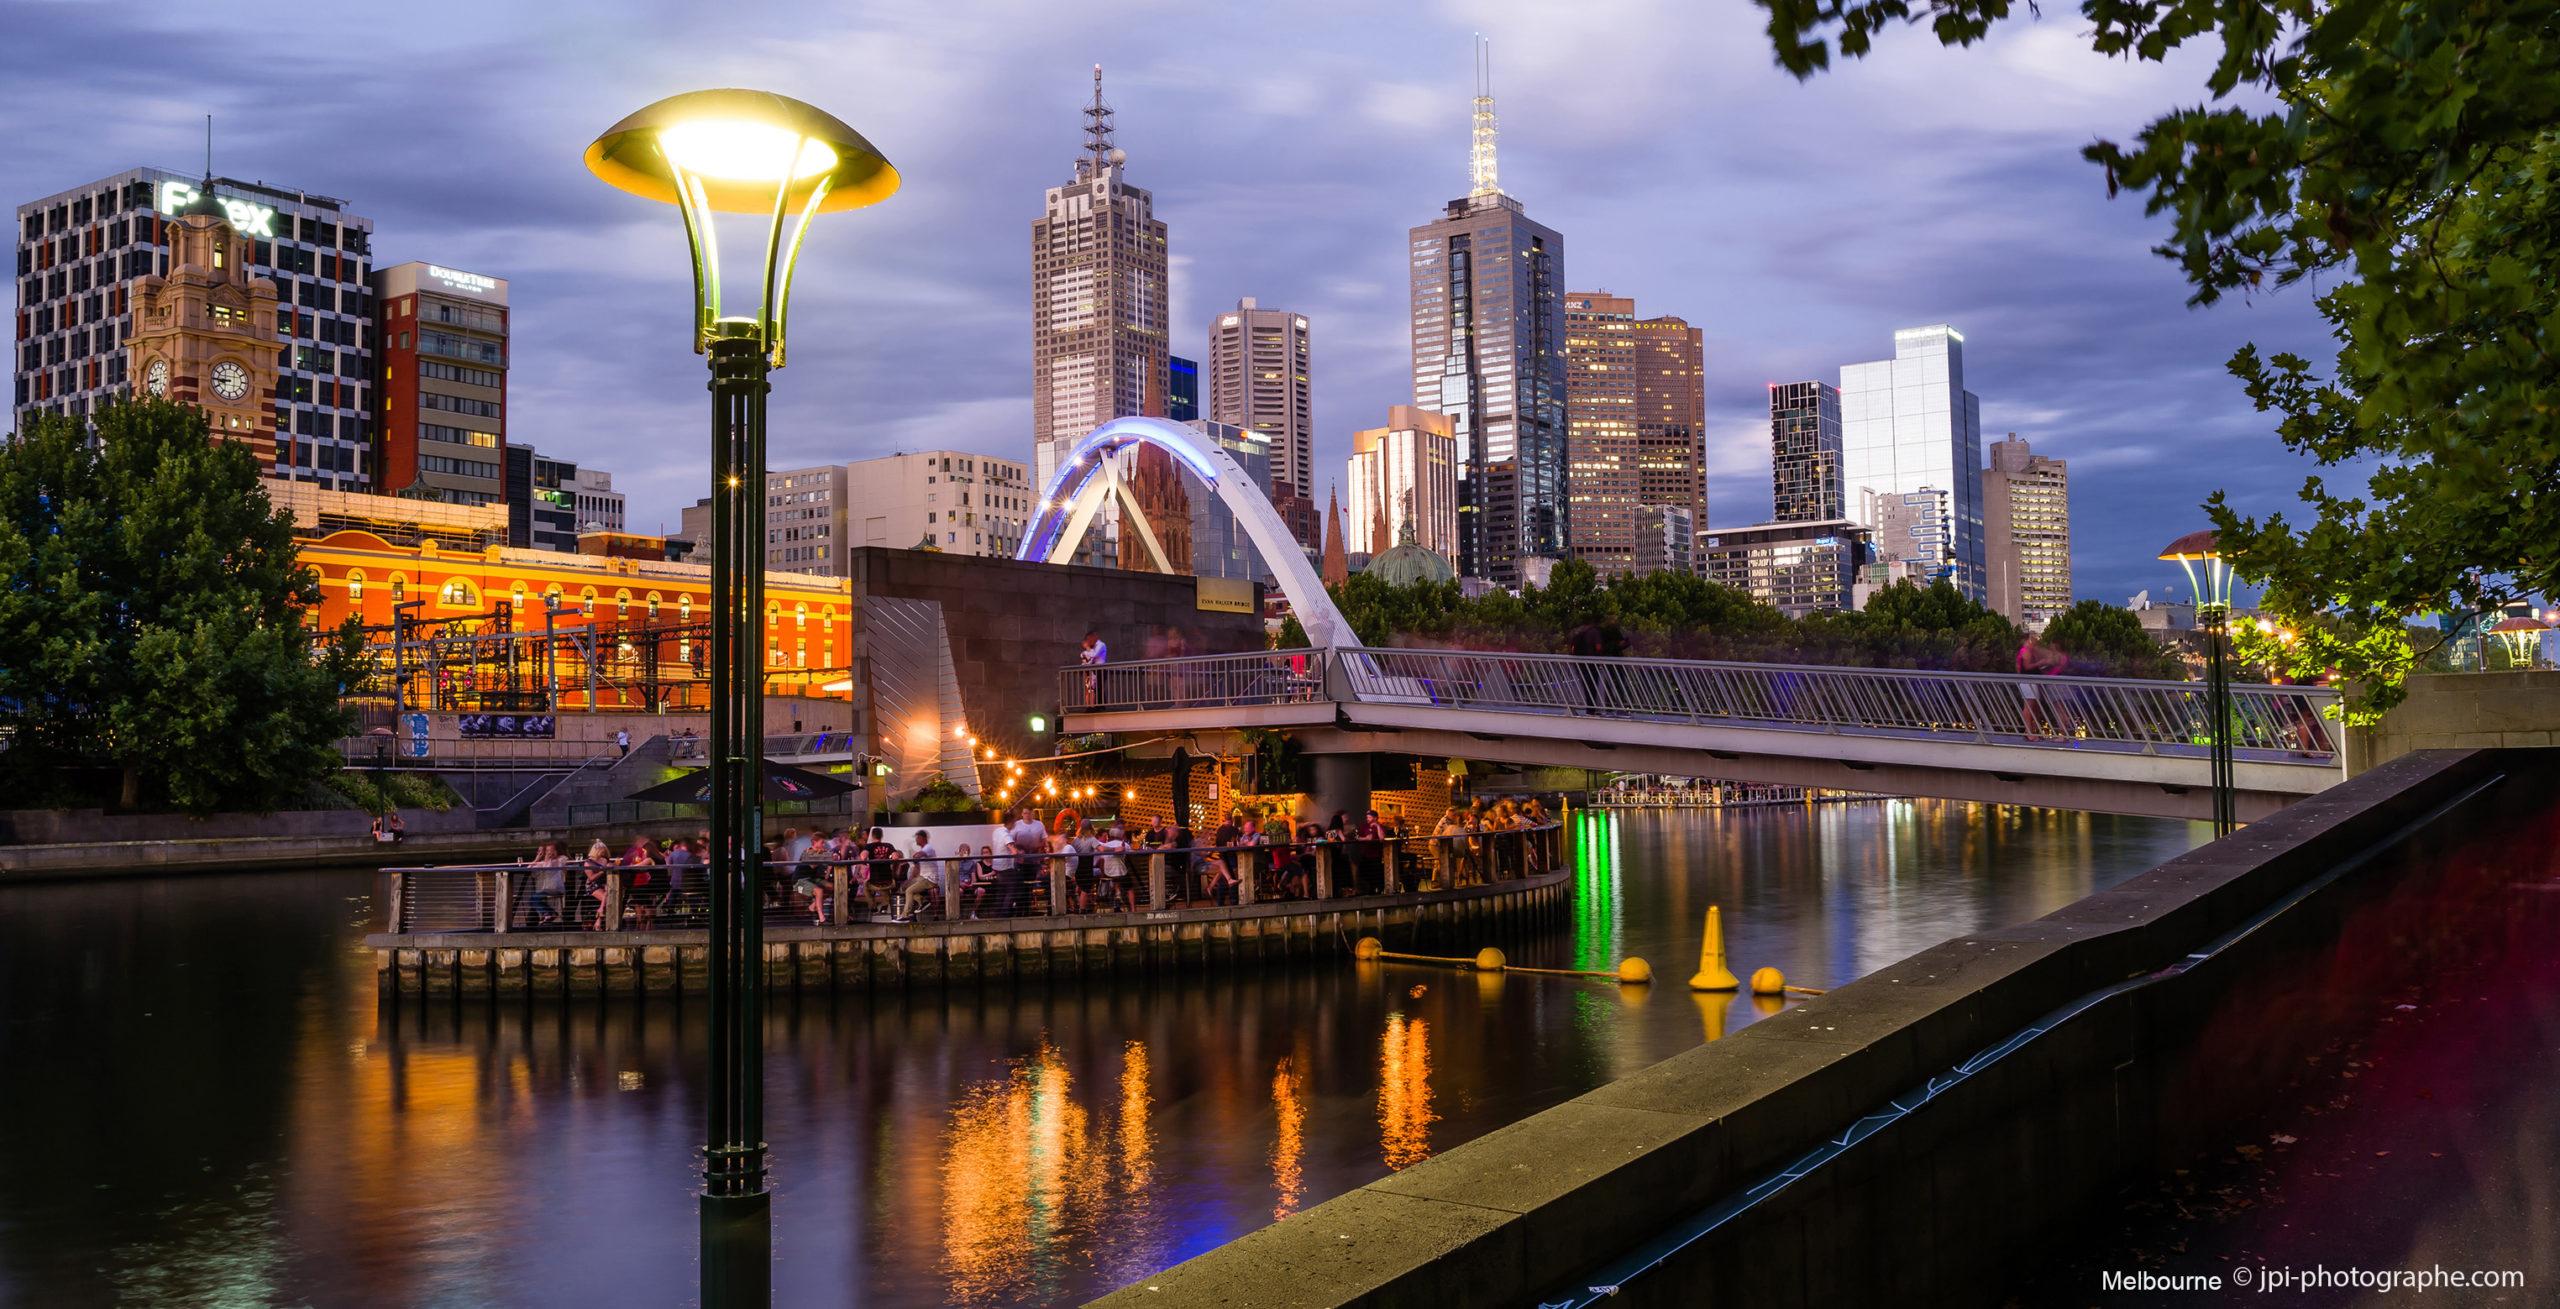 Melbourne, Australie, jpi photographie Mulhouse